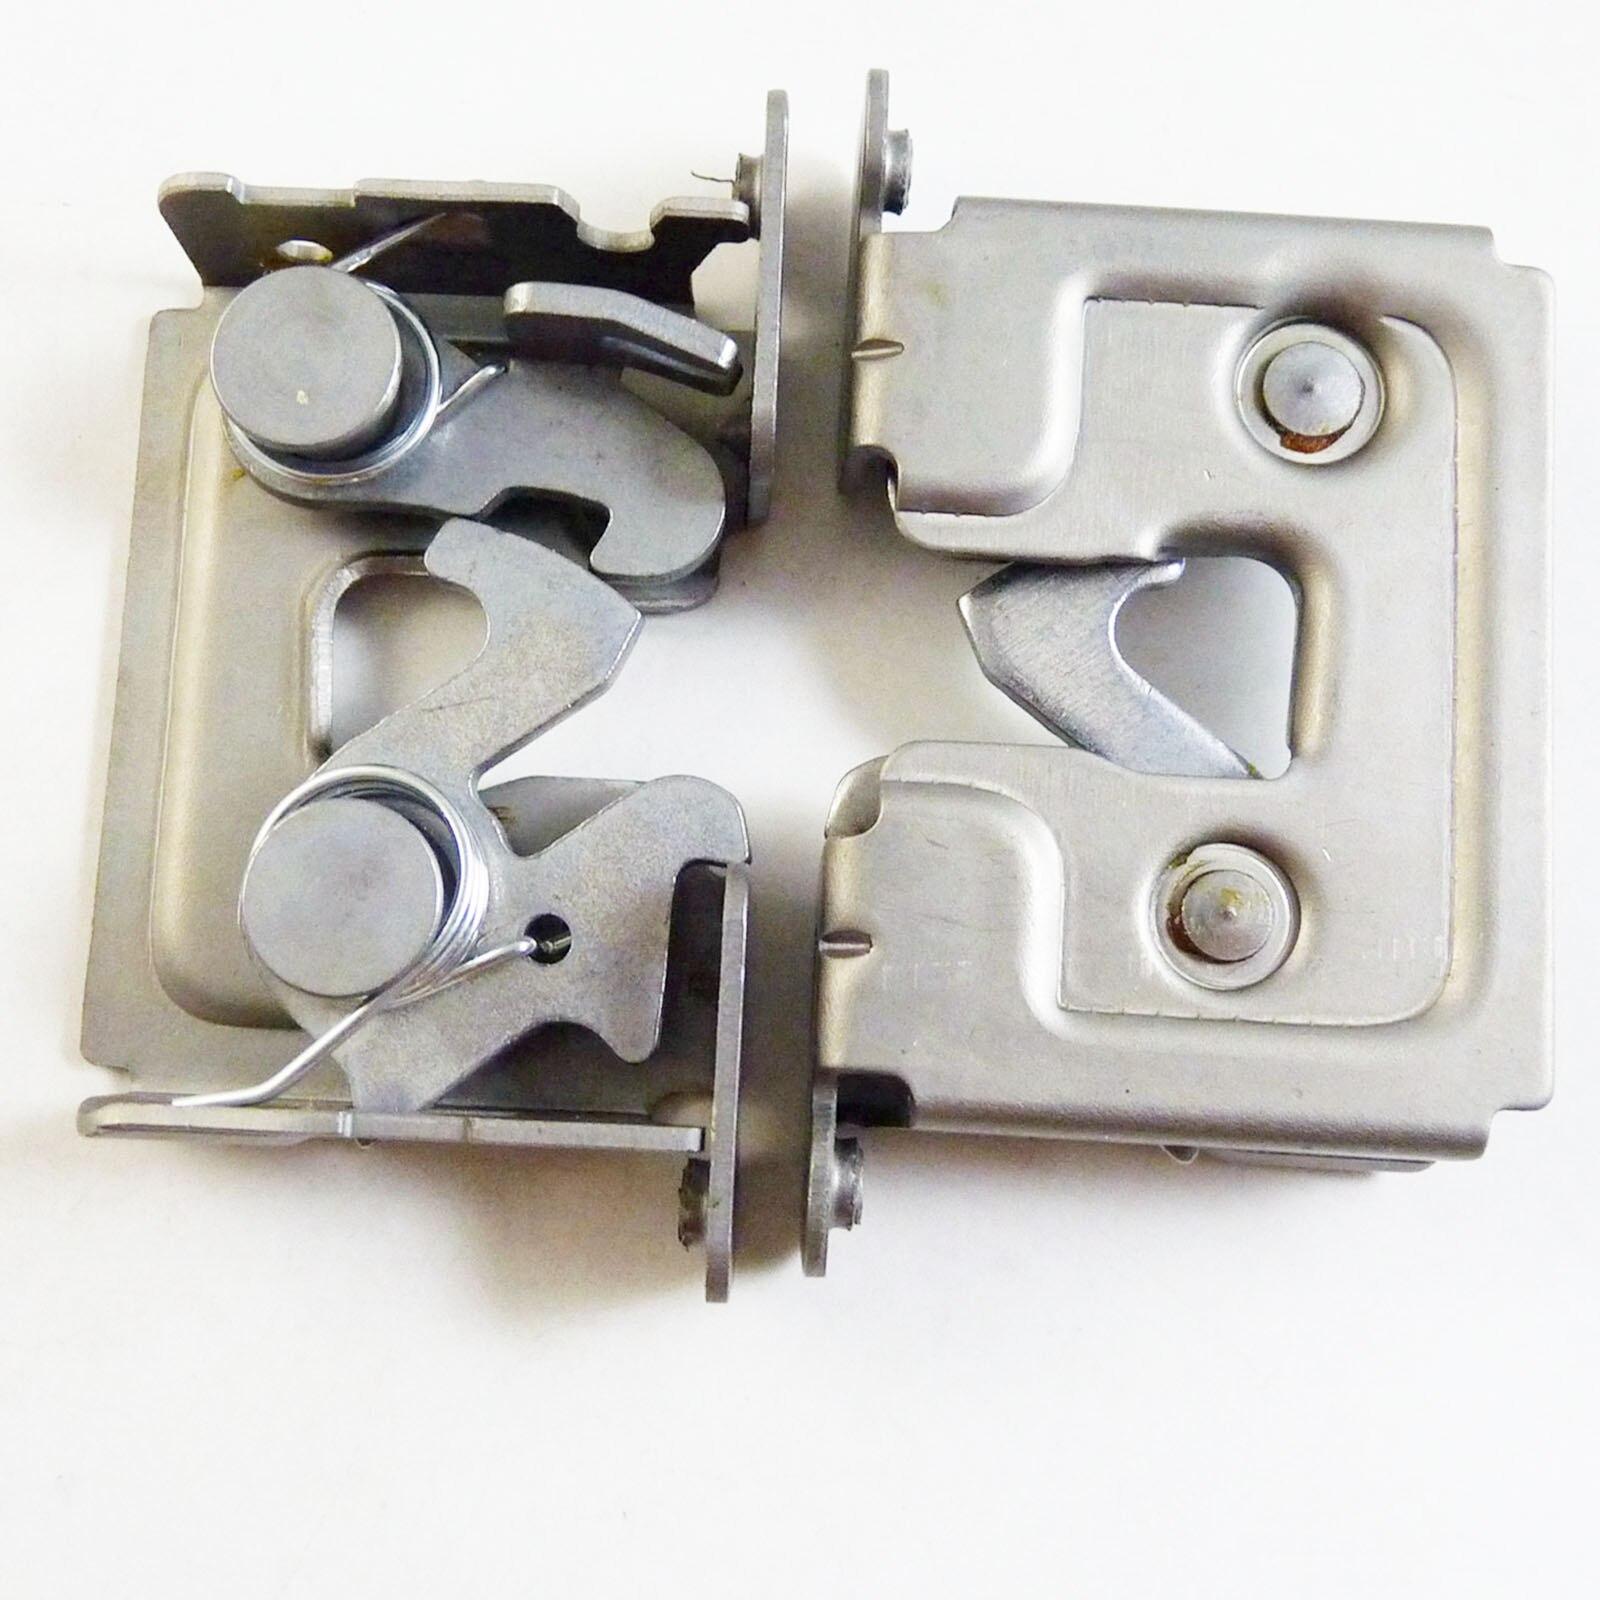 Lower Hood Lock Lid Latch For BMW E82 328i 335i E92 E93 E60 X1 X3 51237008755